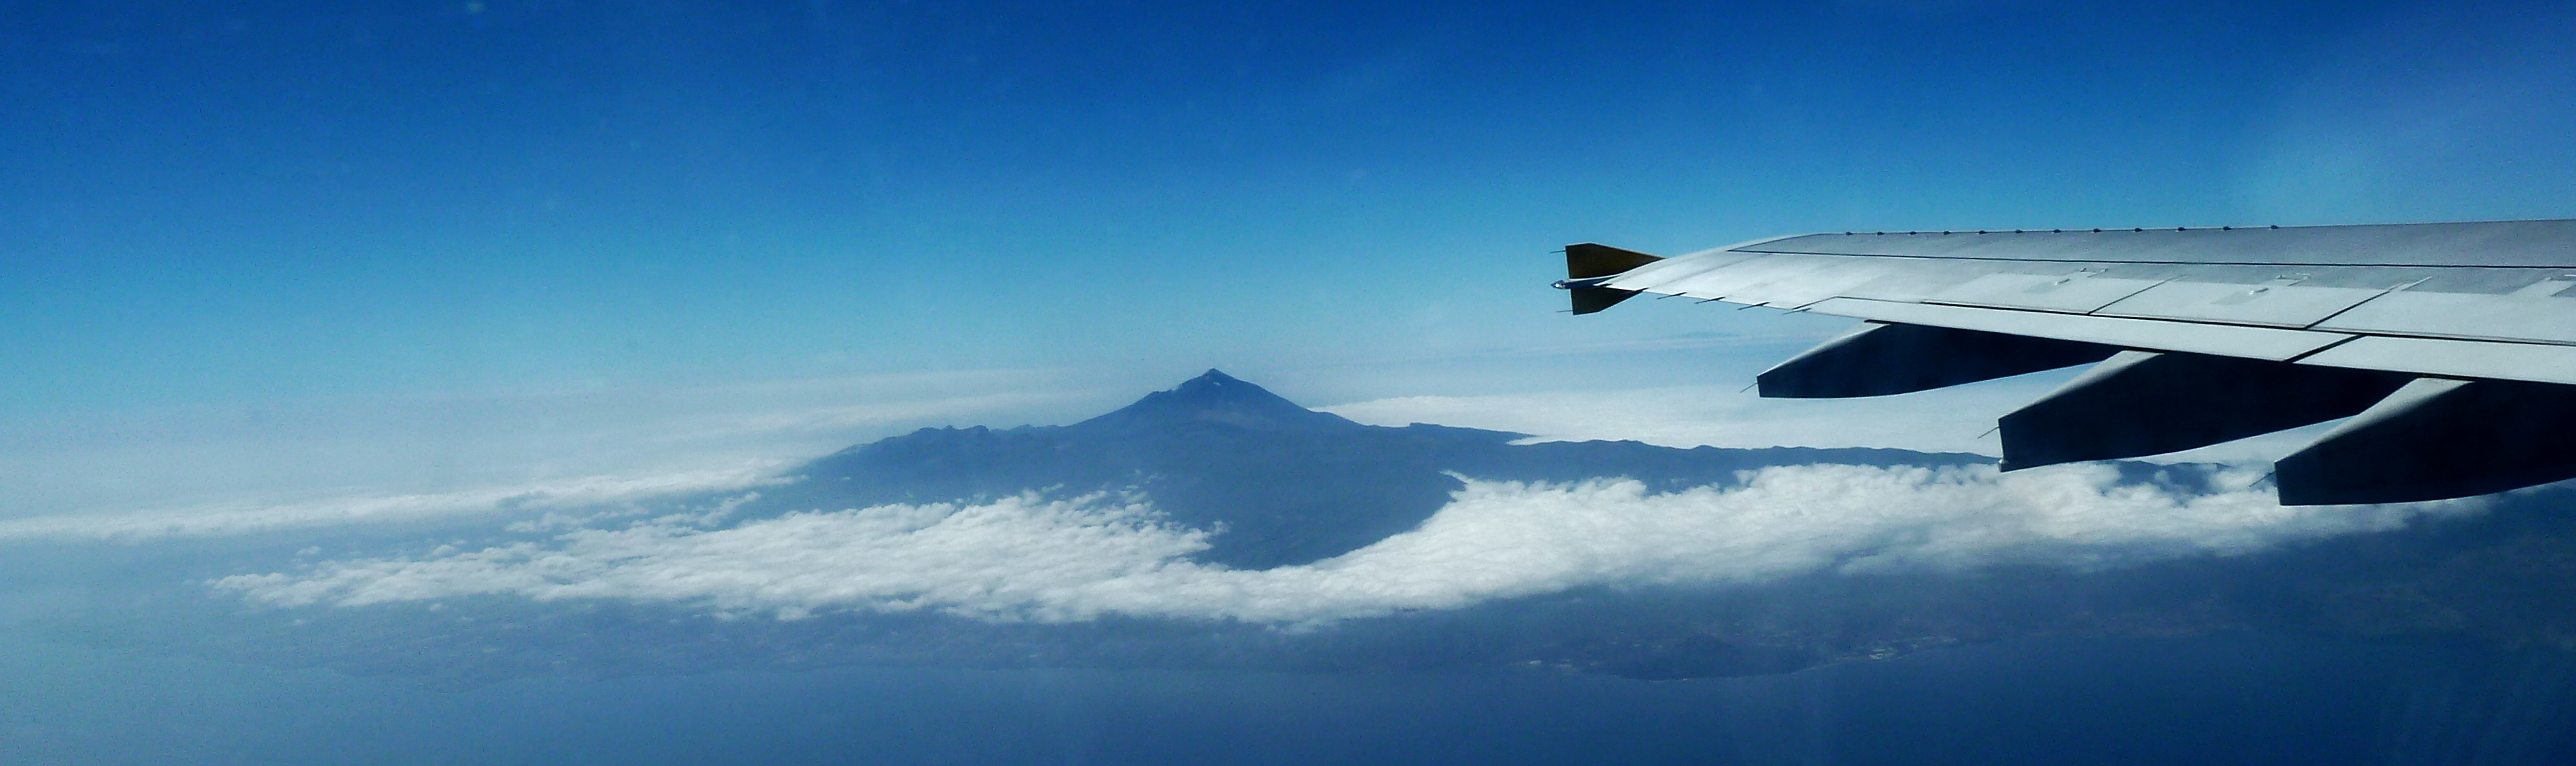 Teide volcano Tenerife aerial